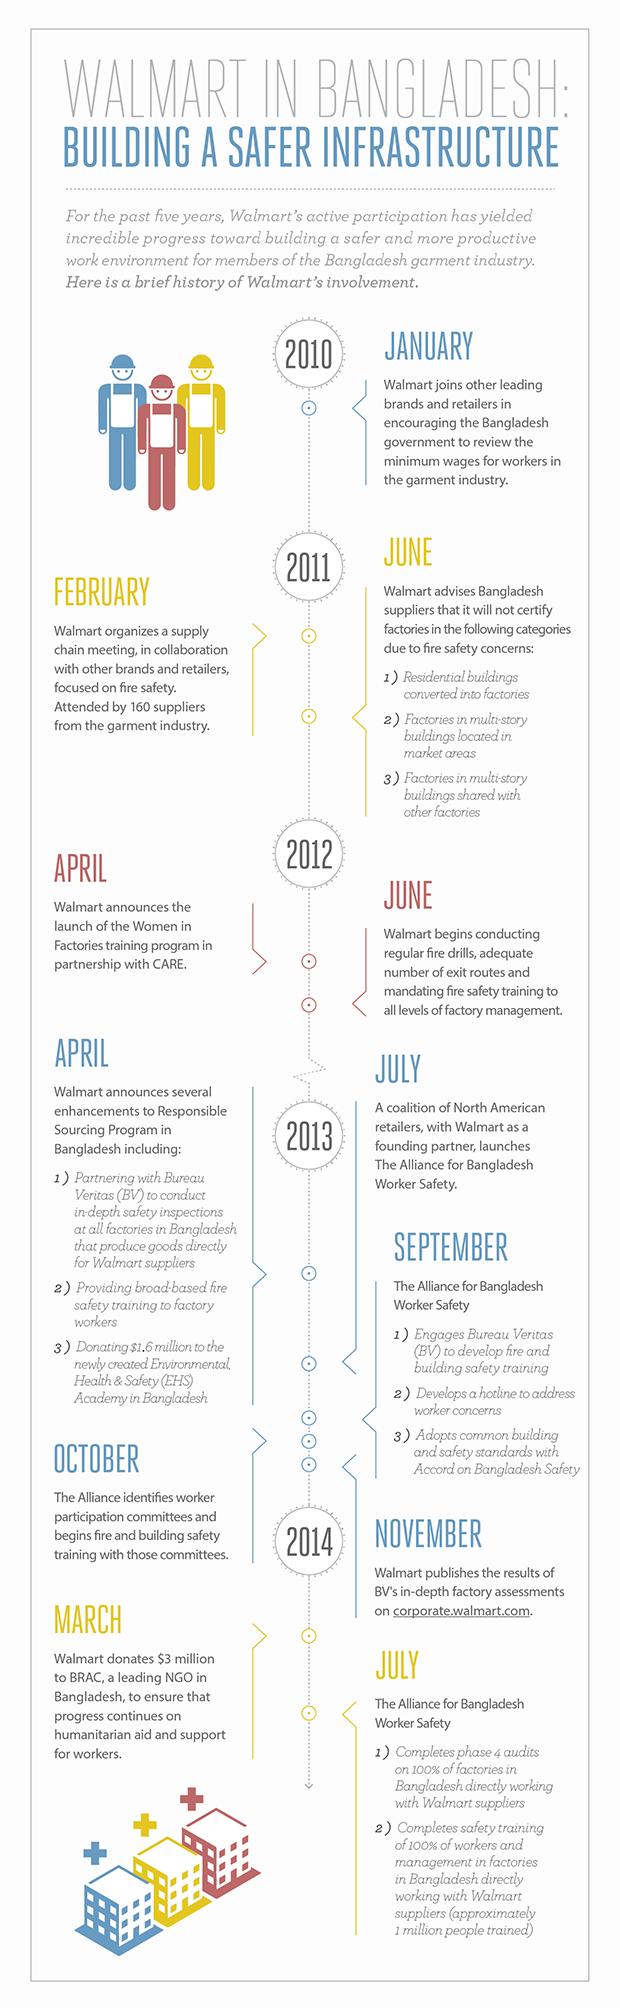 Walmart in Bangladesh Timeline